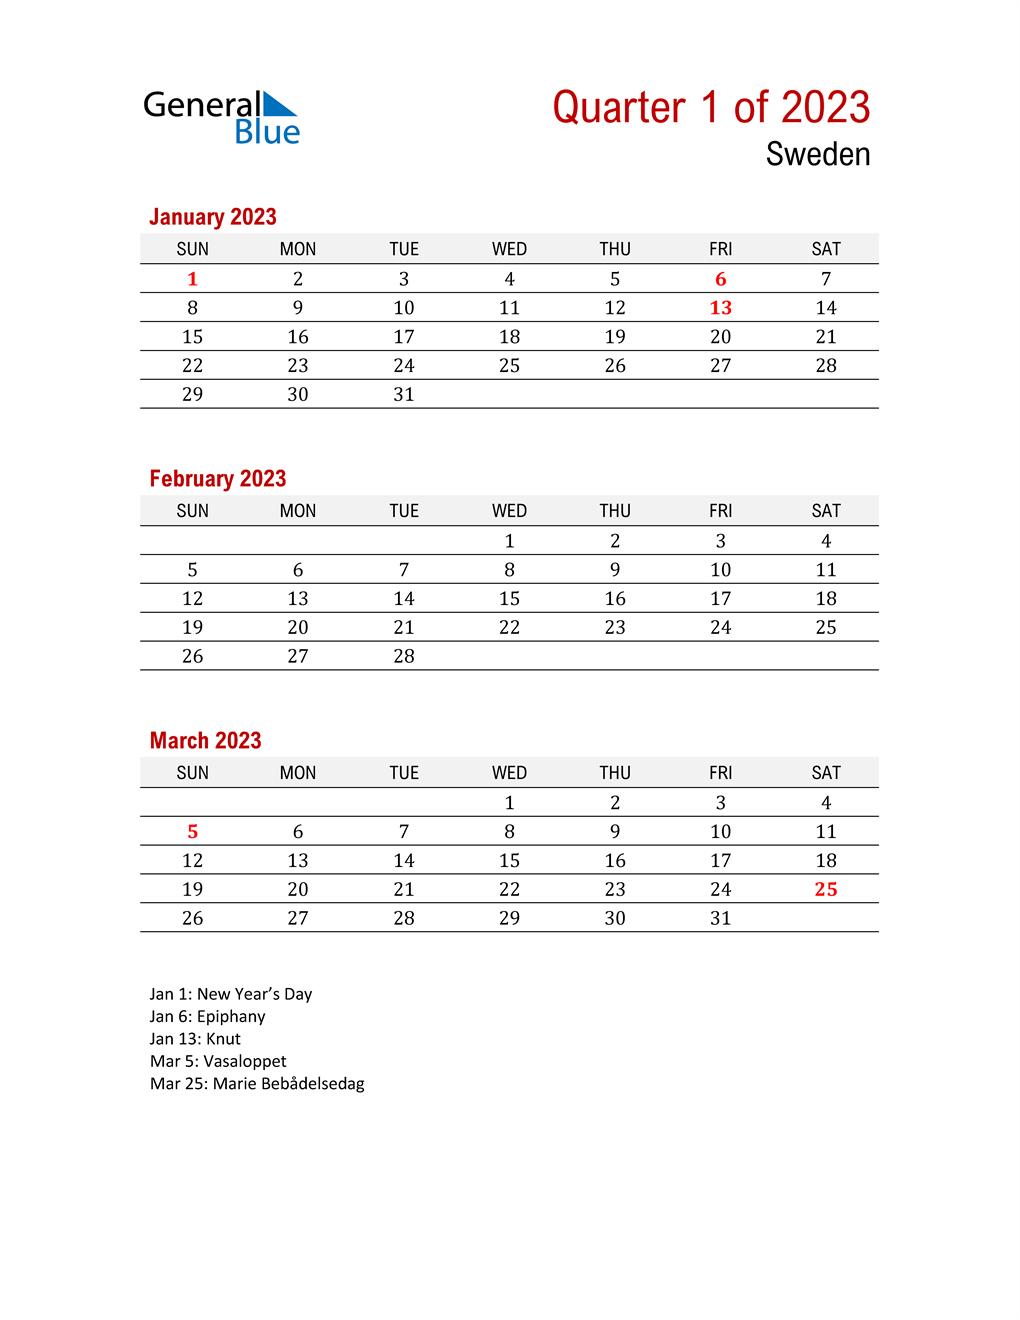 Printable Three Month Calendar for Sweden